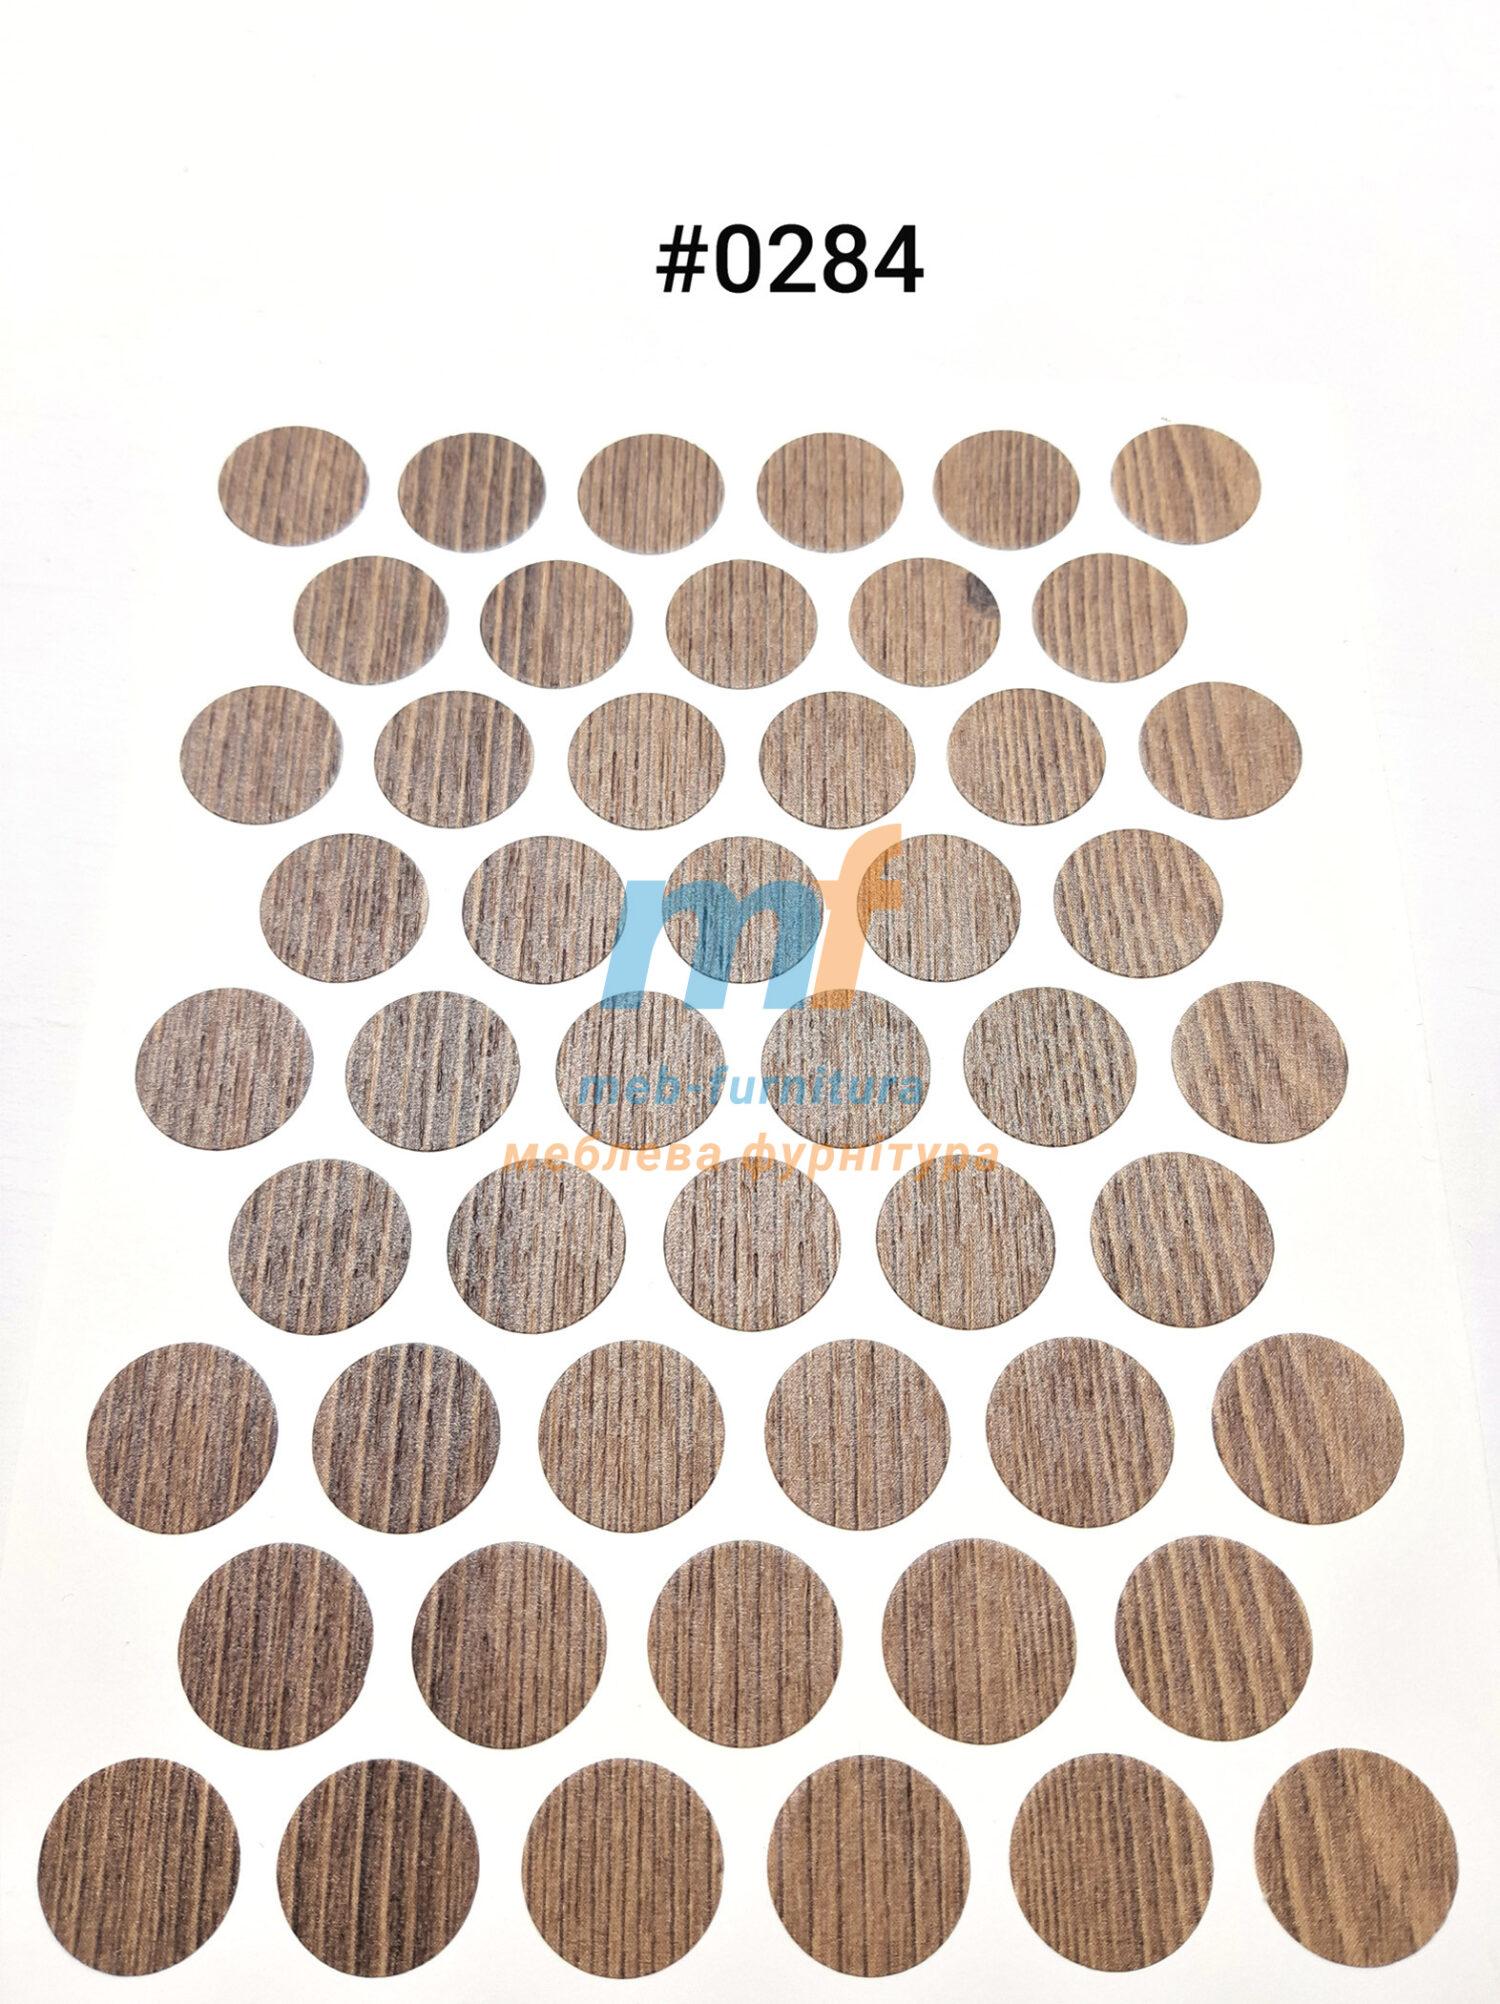 Заглушка на самоклейке для конфирмата,шурупа (0284)